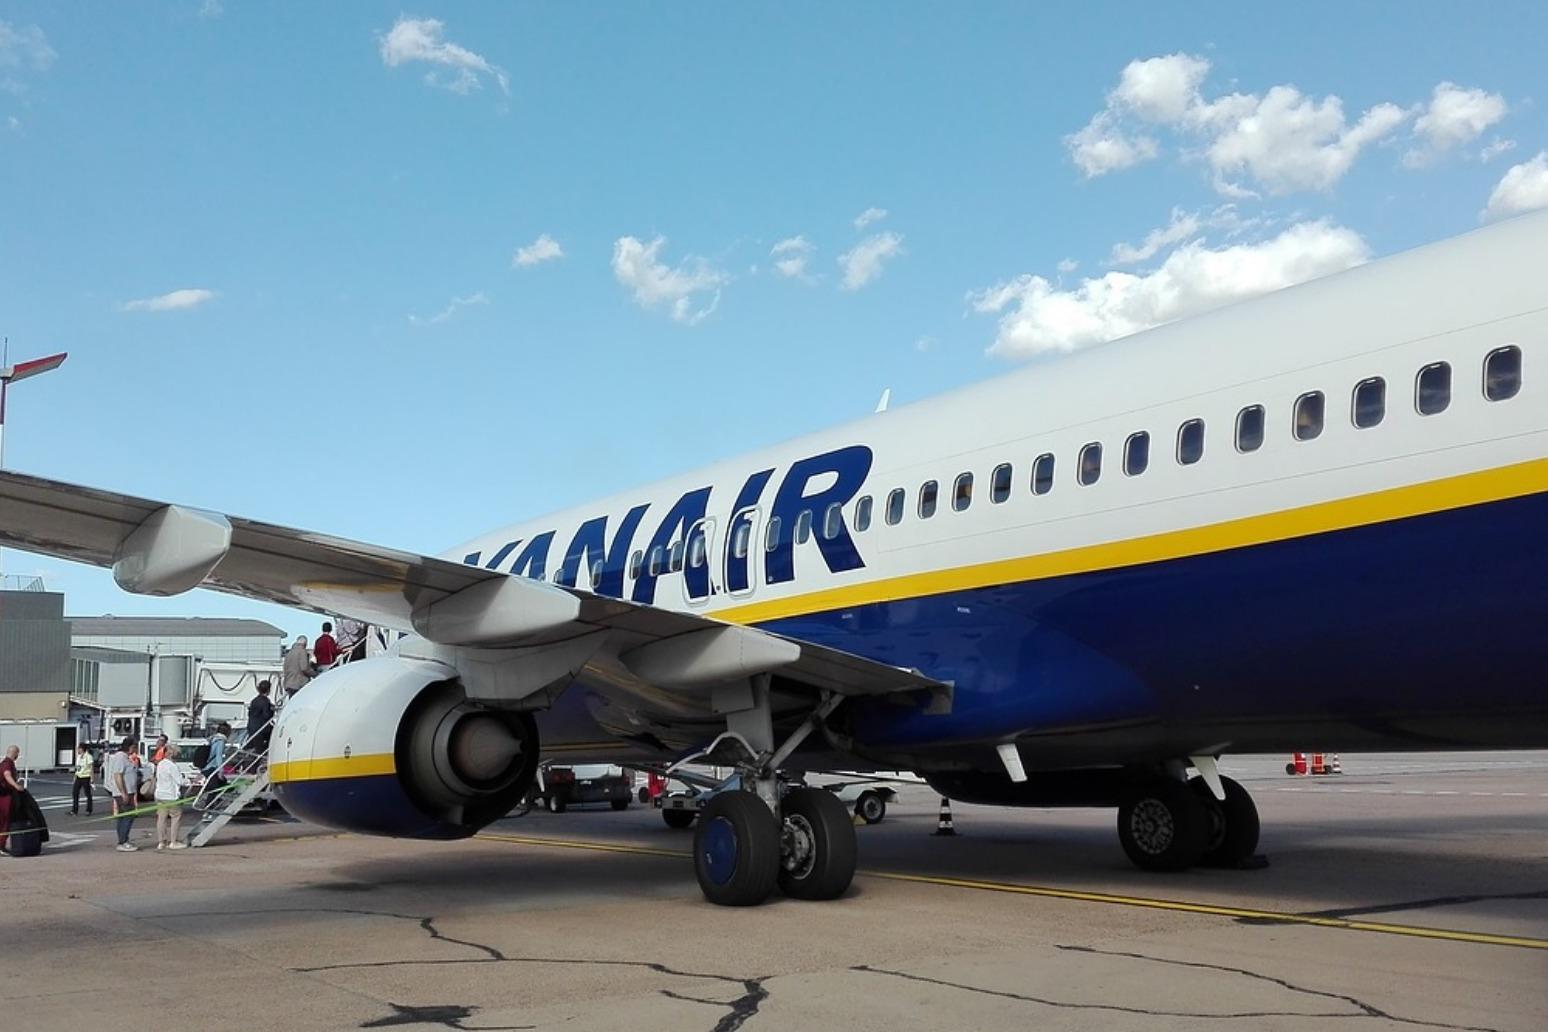 No disruption to Ryanair flights because of strike